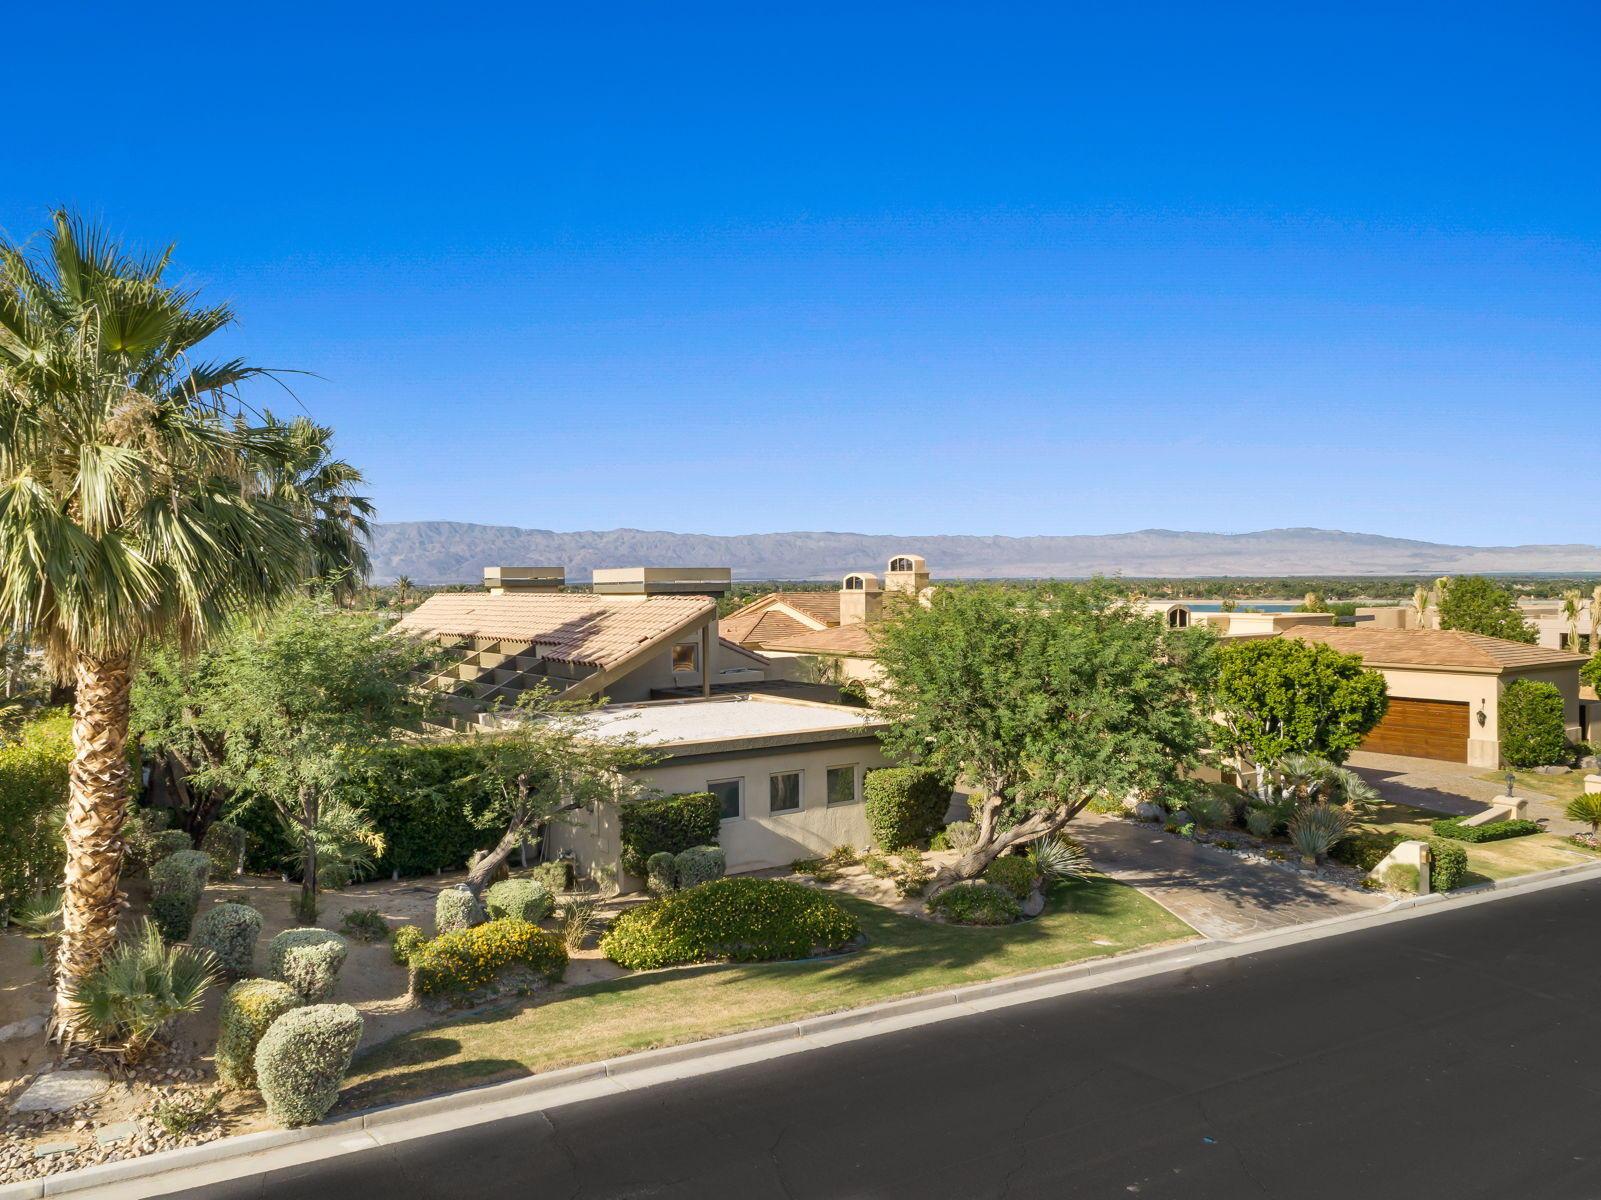 79480 Tom Fazio Lane N Lane N, La Quinta, California 92253, 2 Bedrooms Bedrooms, ,3 BathroomsBathrooms,Residential,For Sale,79480 Tom Fazio Lane N Lane N,219045183